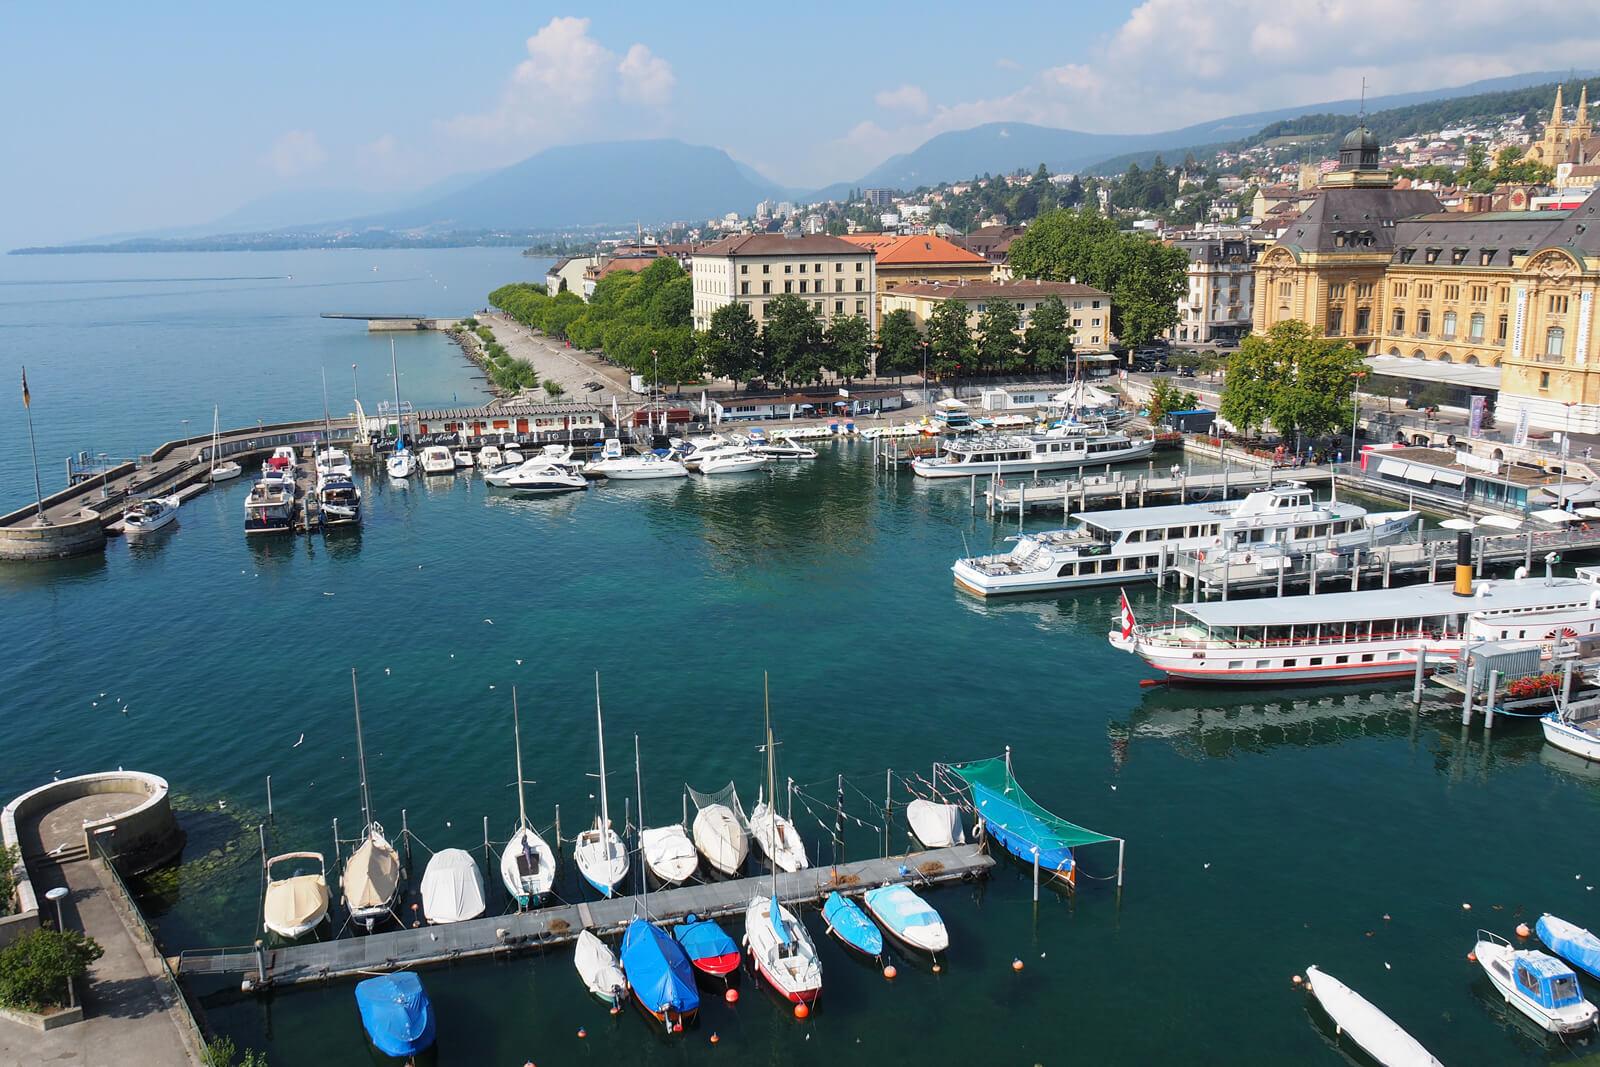 View of the Harbor in Neuchâtel, Switzerland